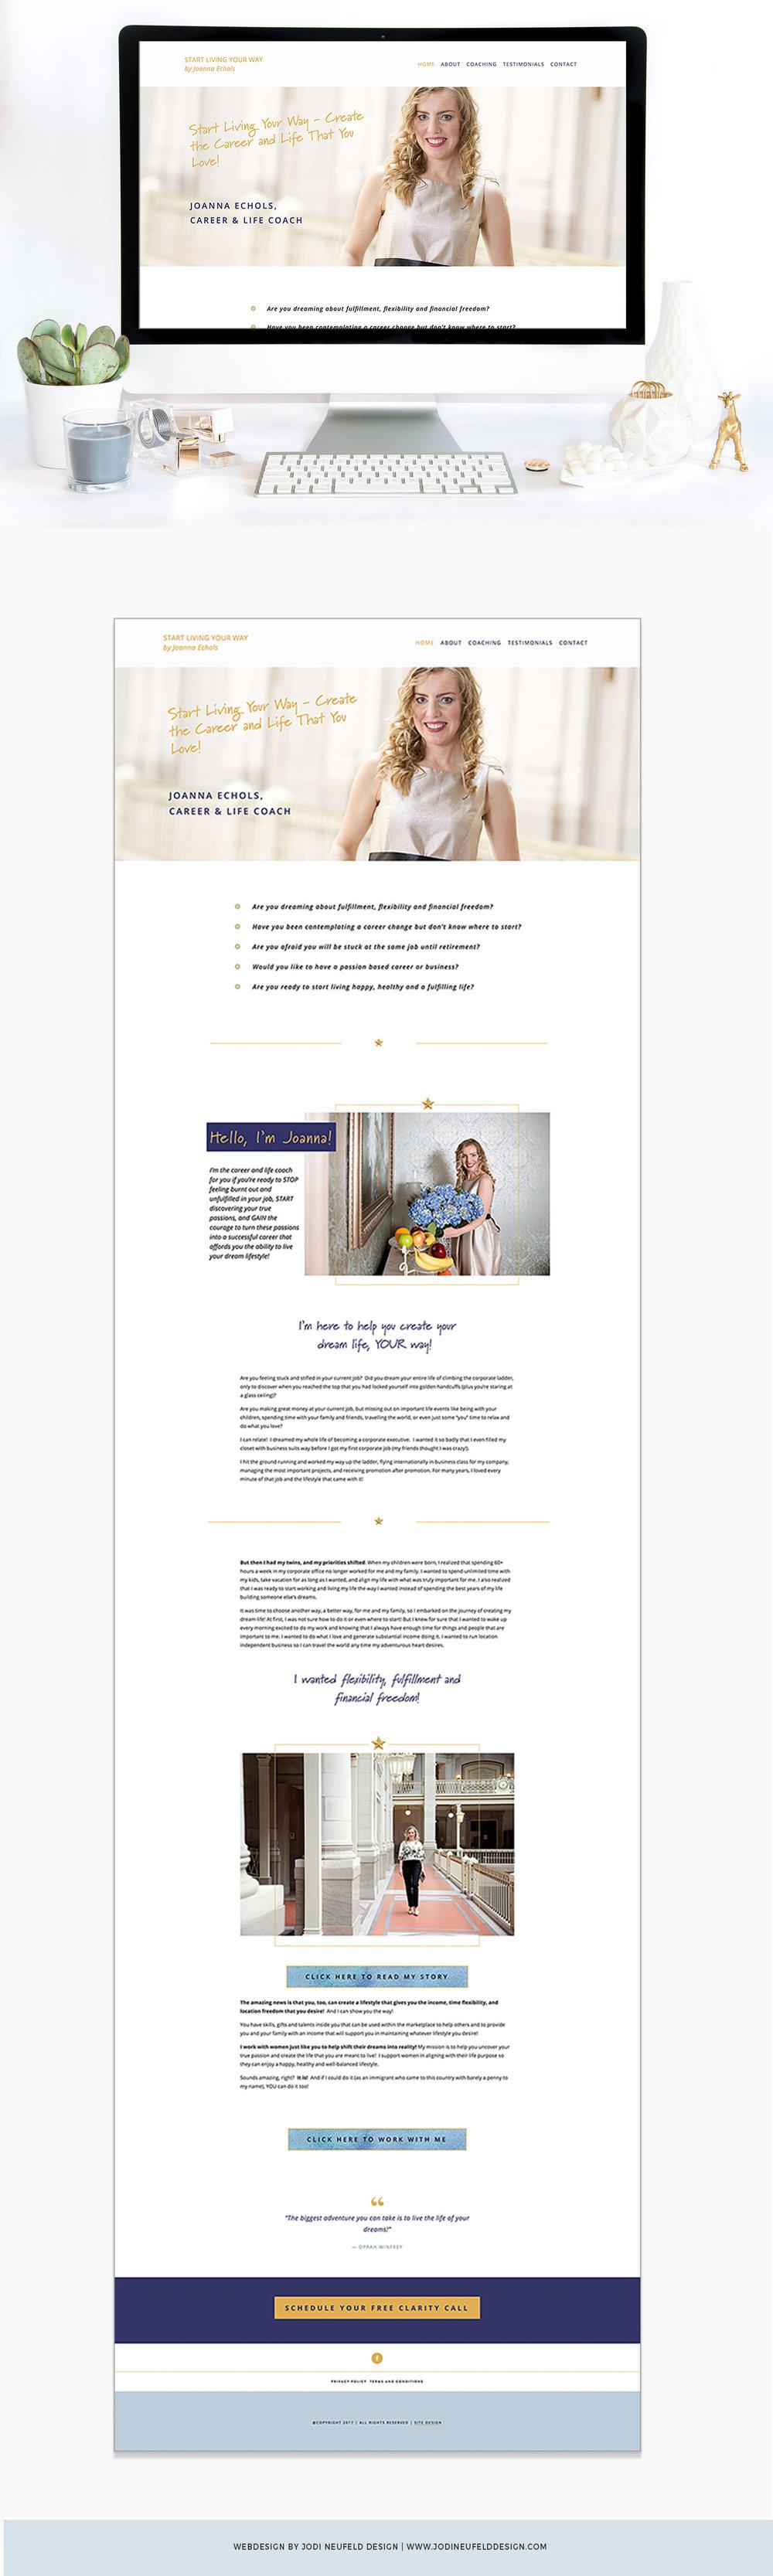 Joanna Echols home page web design | Squarespace web design | Jodi Neufeld Design